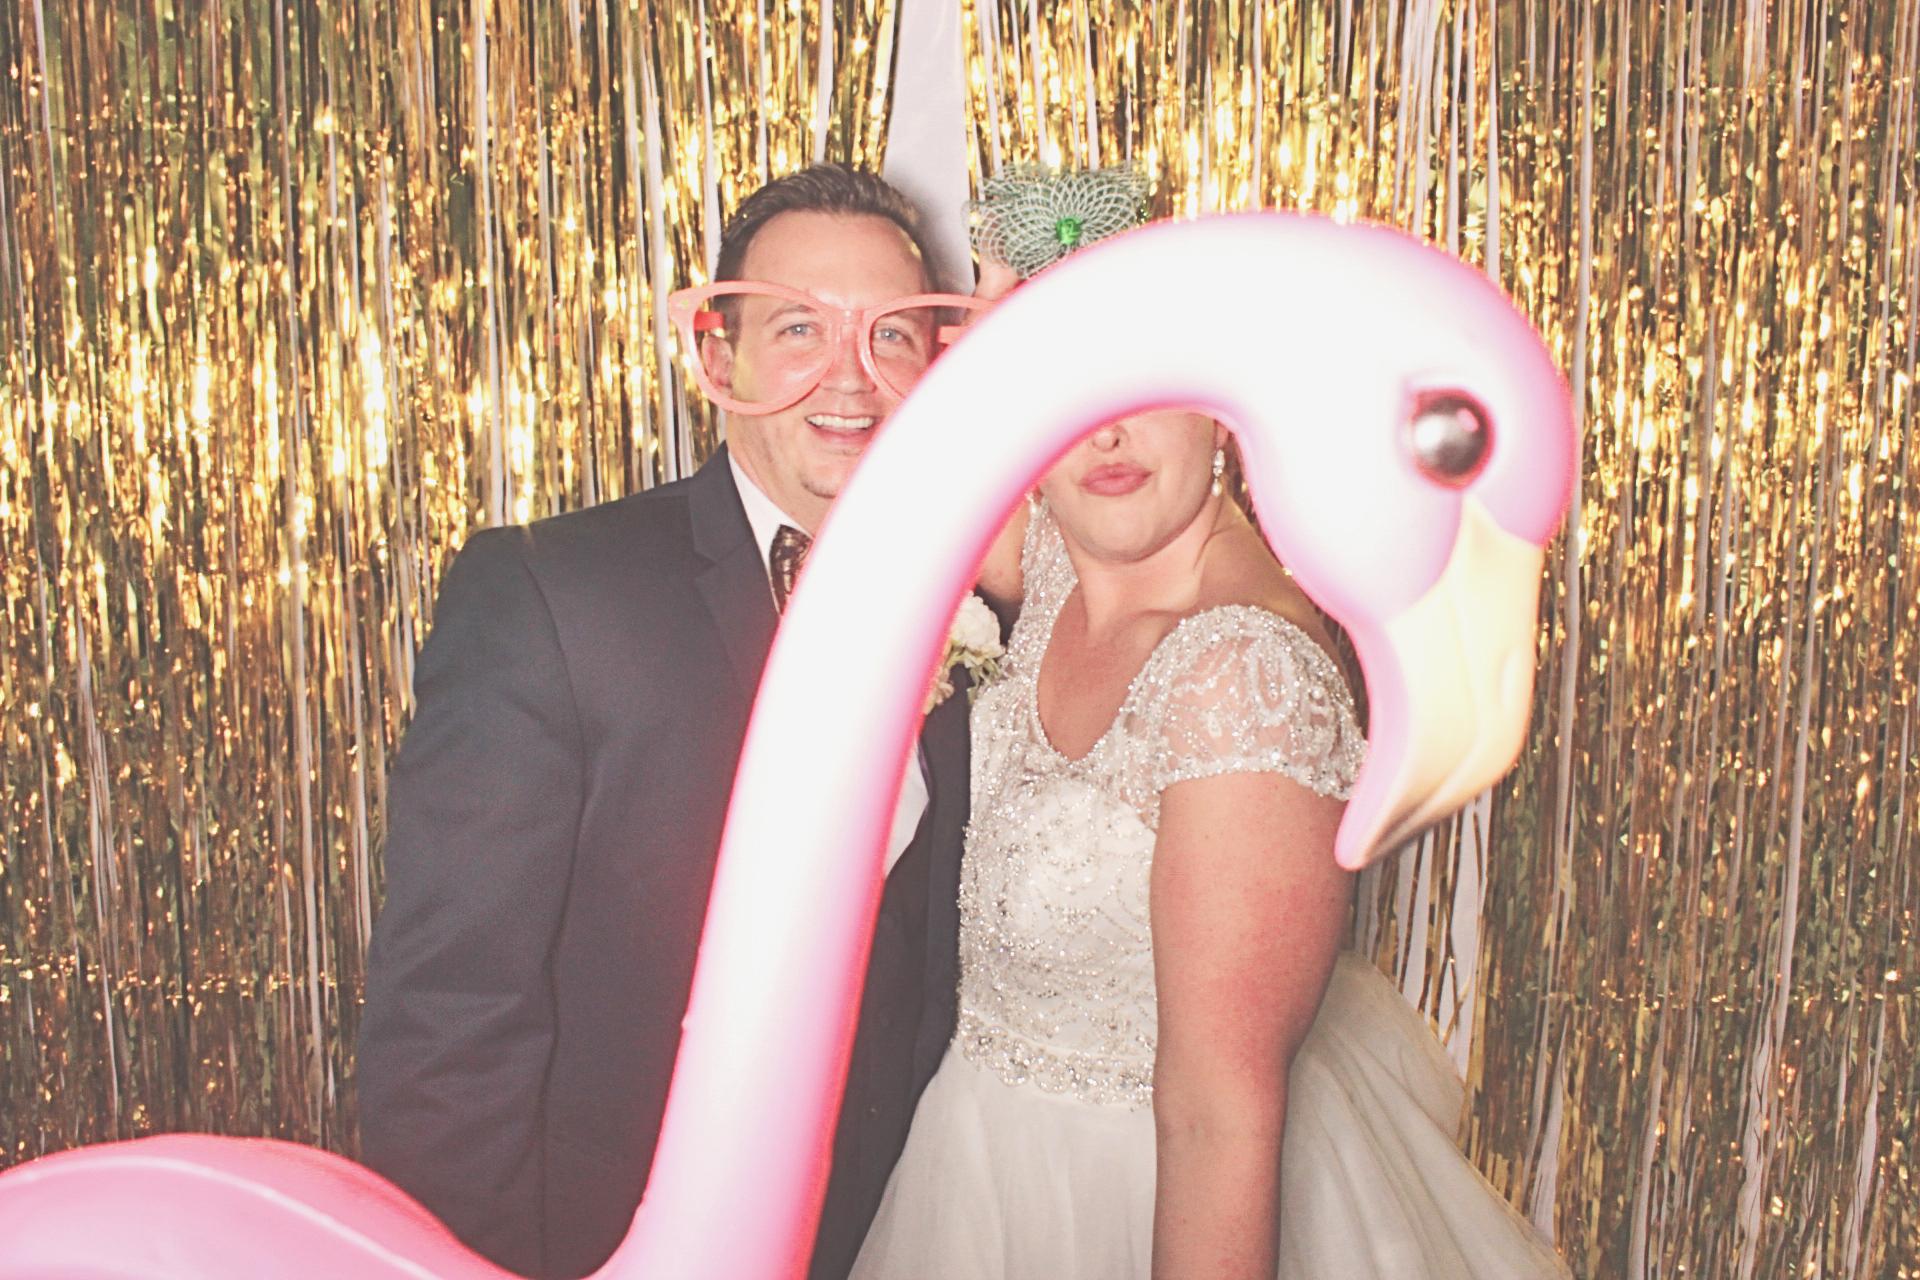 5-14-16 MO Atlanta The Barn at Buffalo Creek PhotoBooth - Reed Wedding - RobotBooth20160514186 (1)